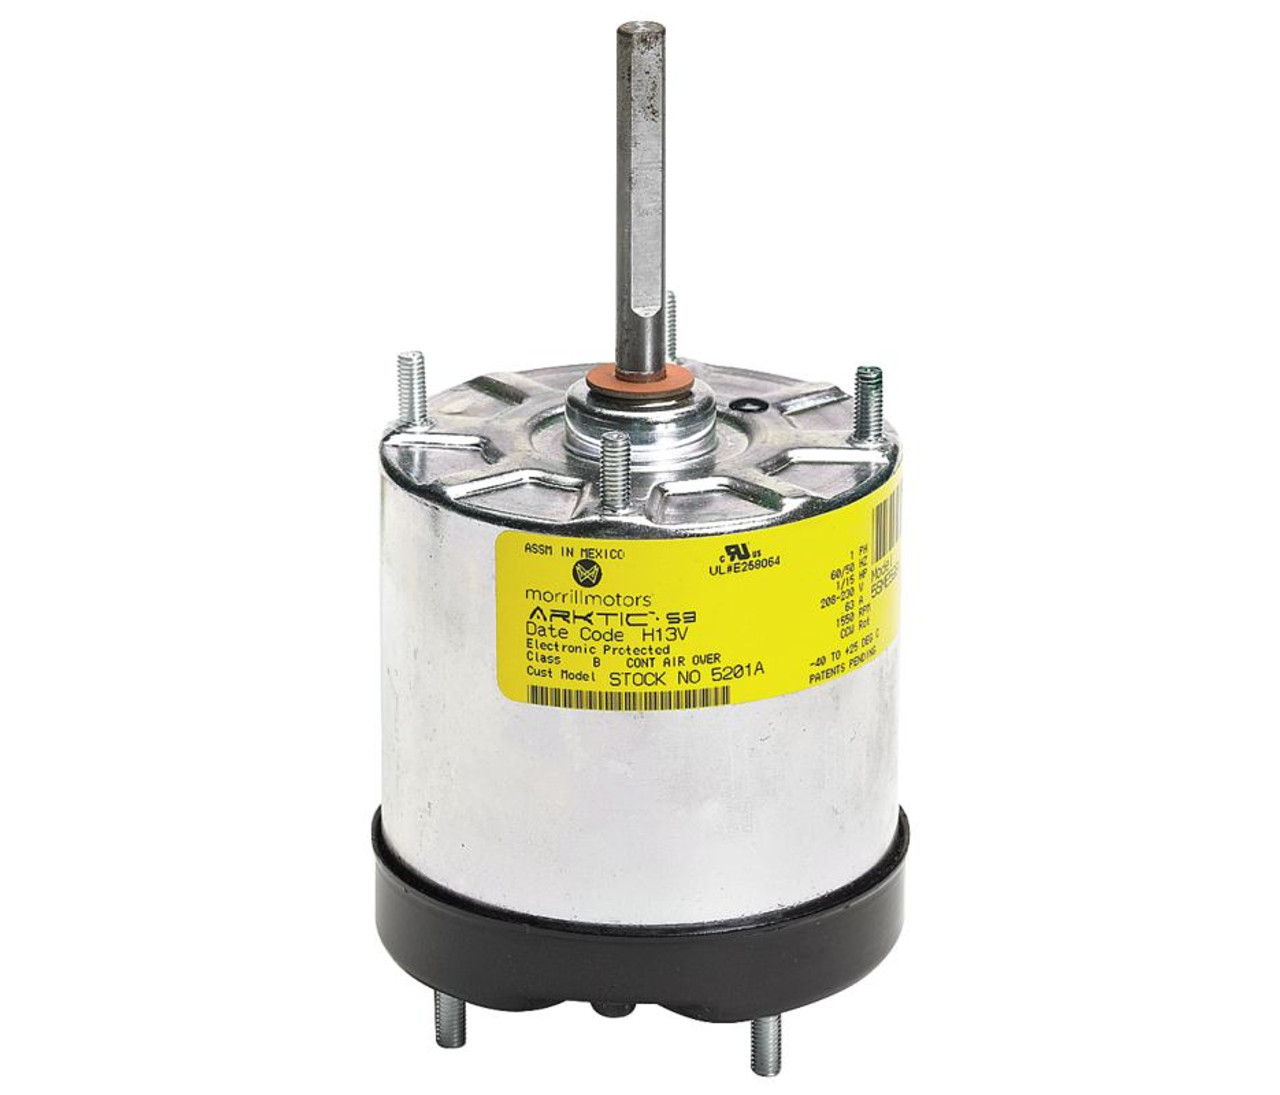 1/15 hp Arktic 59 ECM Refrigeration Motor, CCWLE 1550 RPM, 208-230V Fasco D Wiring Diagram on